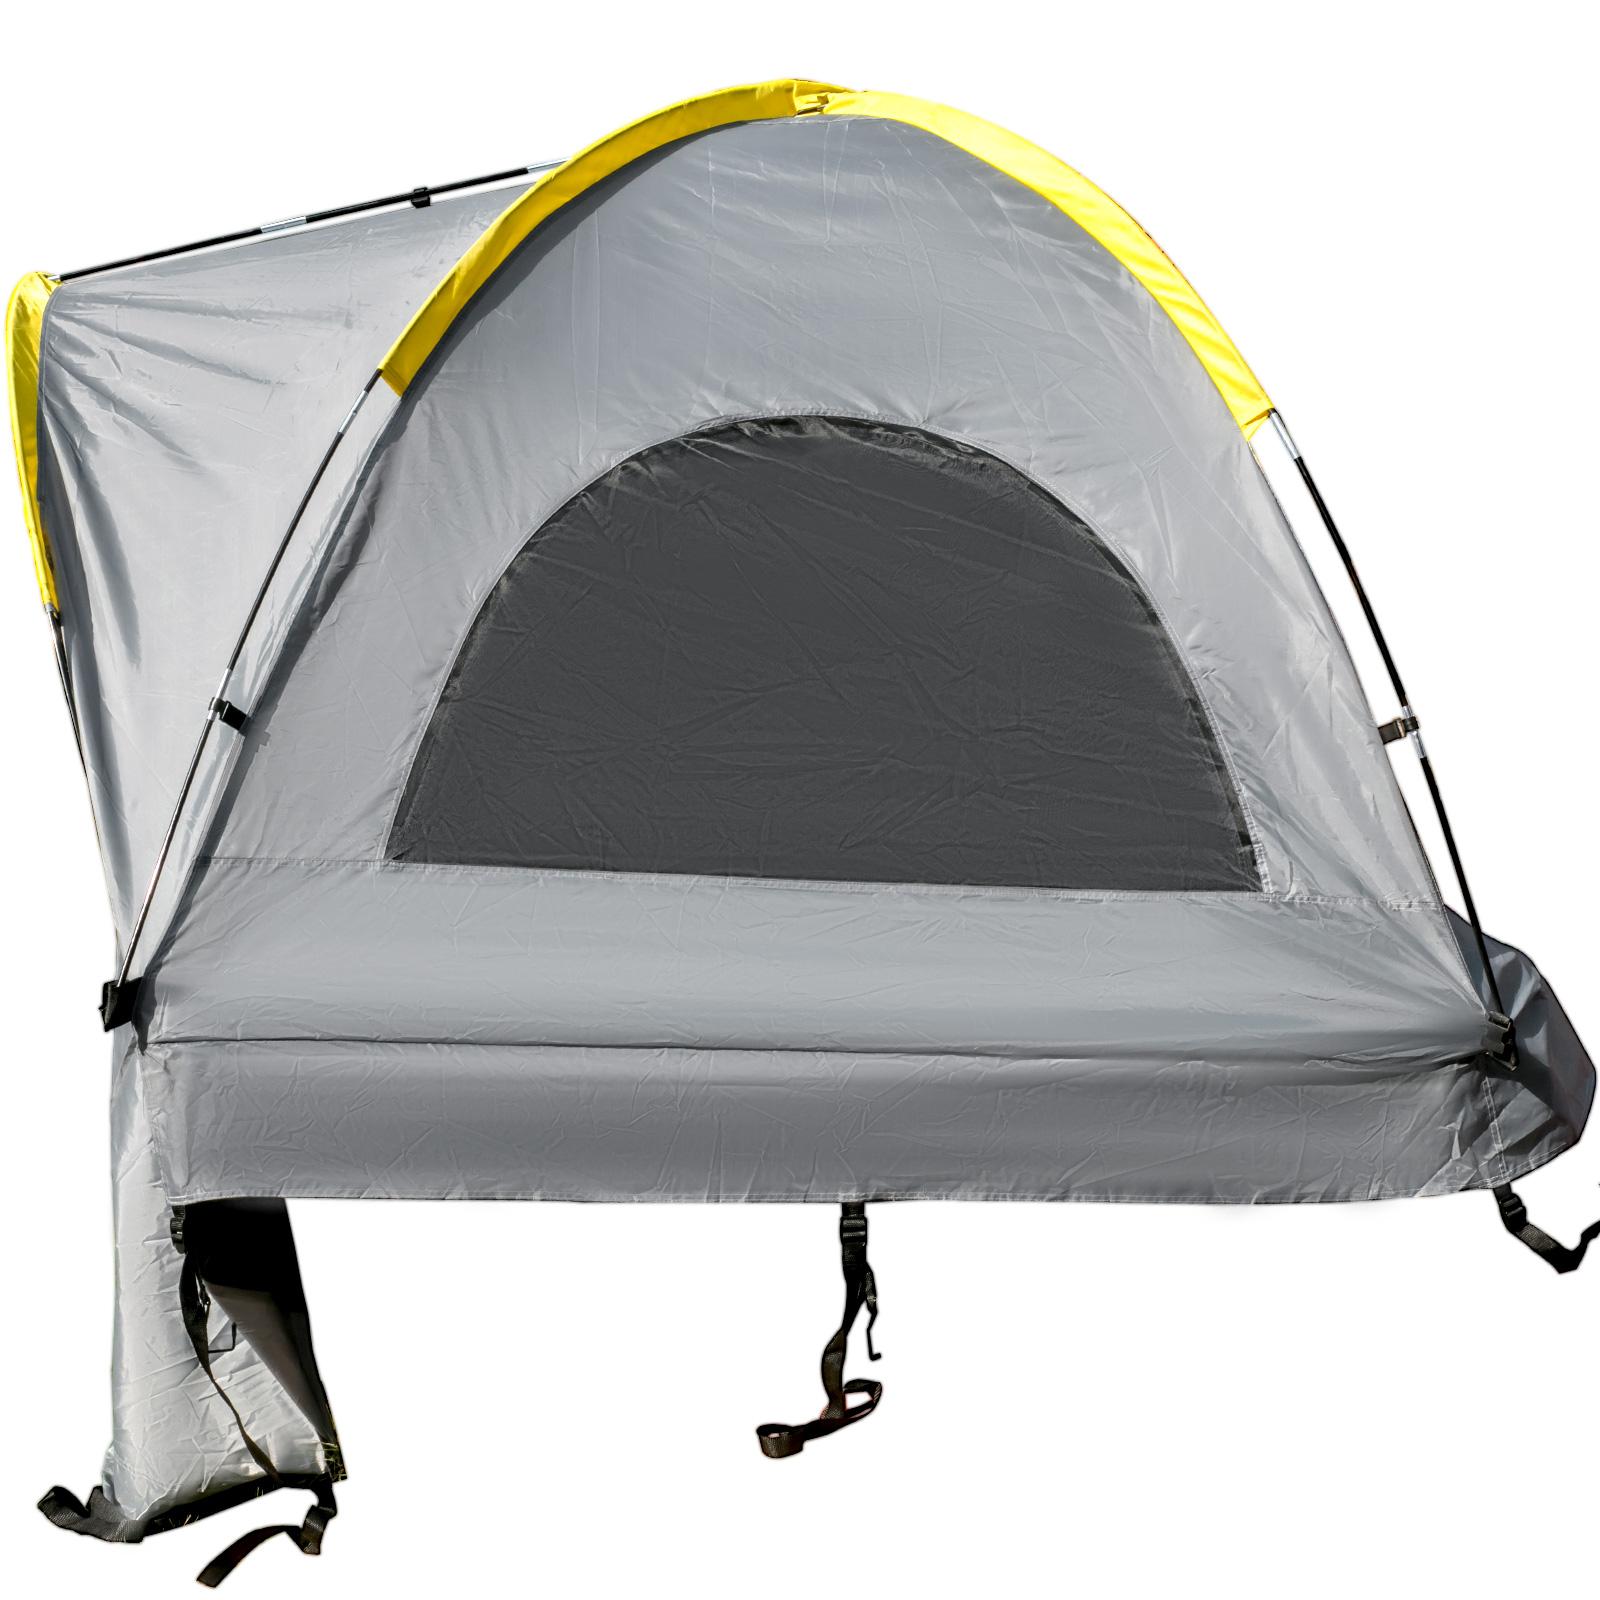 thumbnail 50 - VEVOR Truck Tent Truck Bed Tent 5' - 8' Pickup Tent Waterproof Outdoor Camping